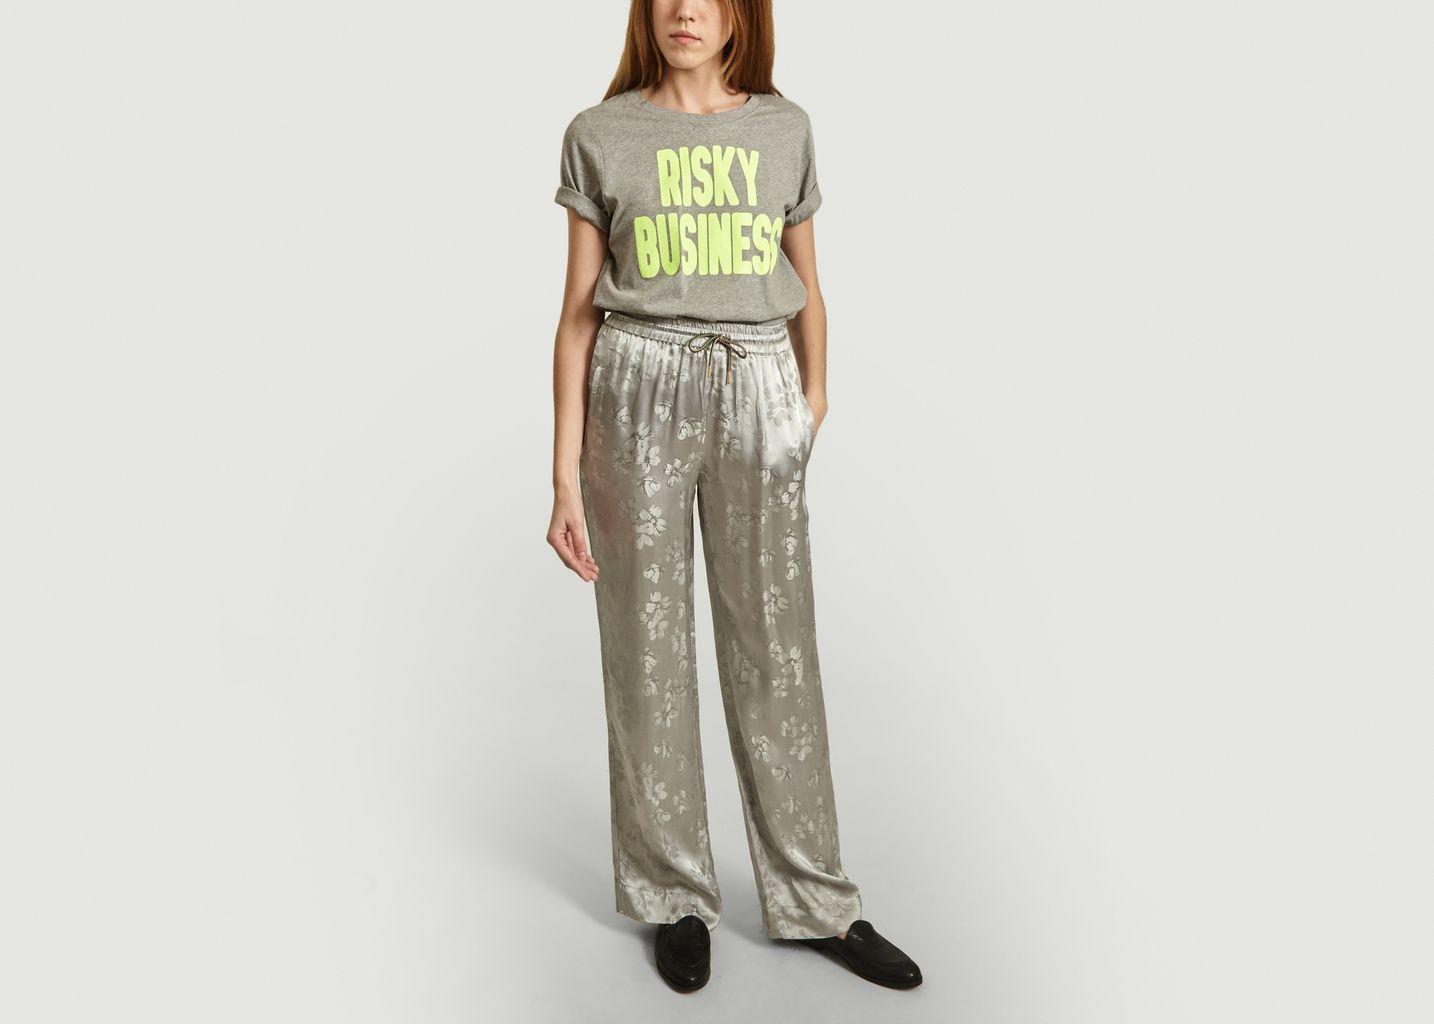 T-Shirt Vlogan Risky Business - Essentiel Antwerp